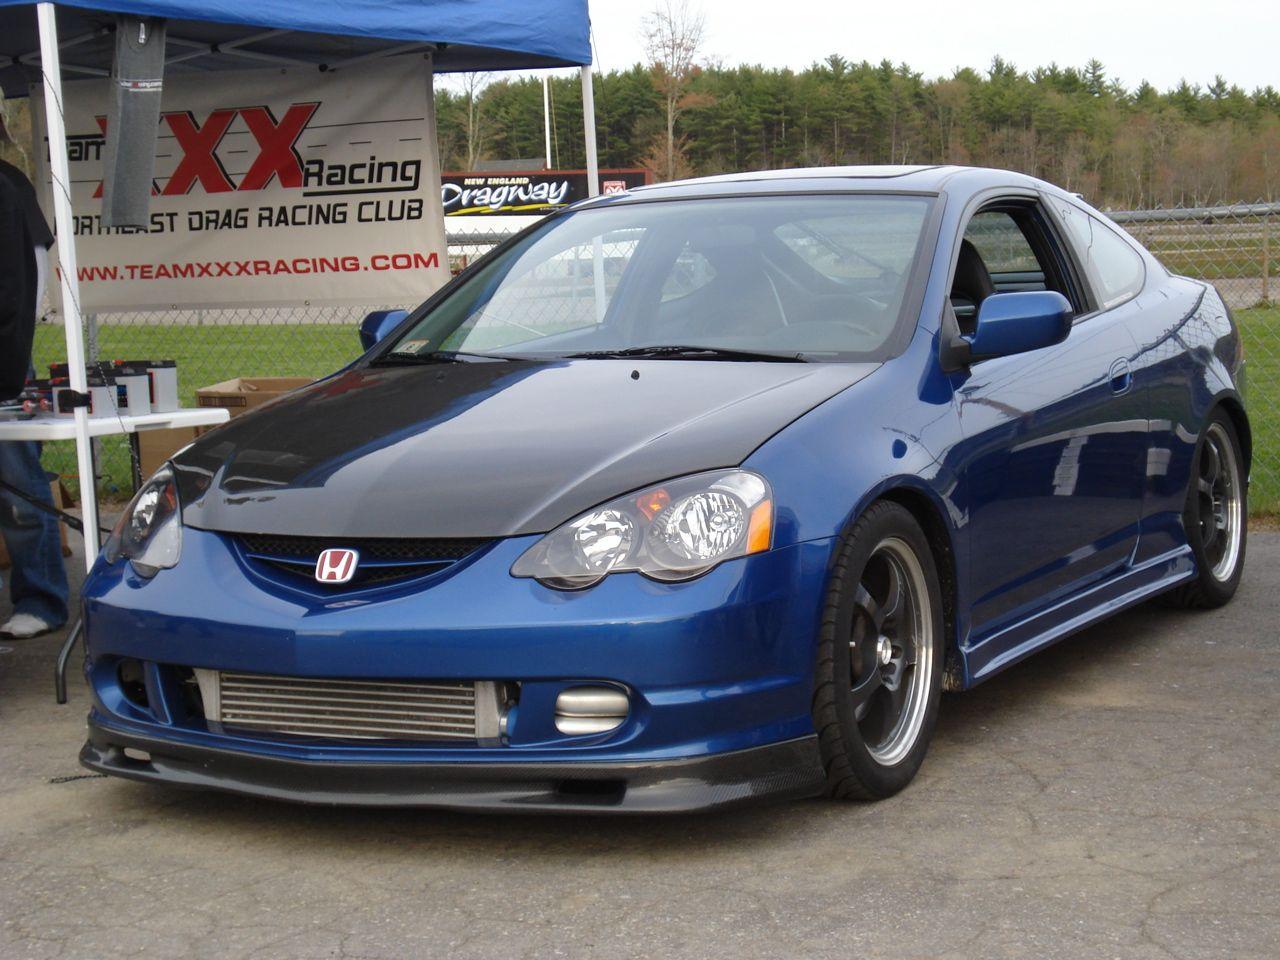 Acura RSX Type S | Acura rsx type s, Acura rsx, Acura